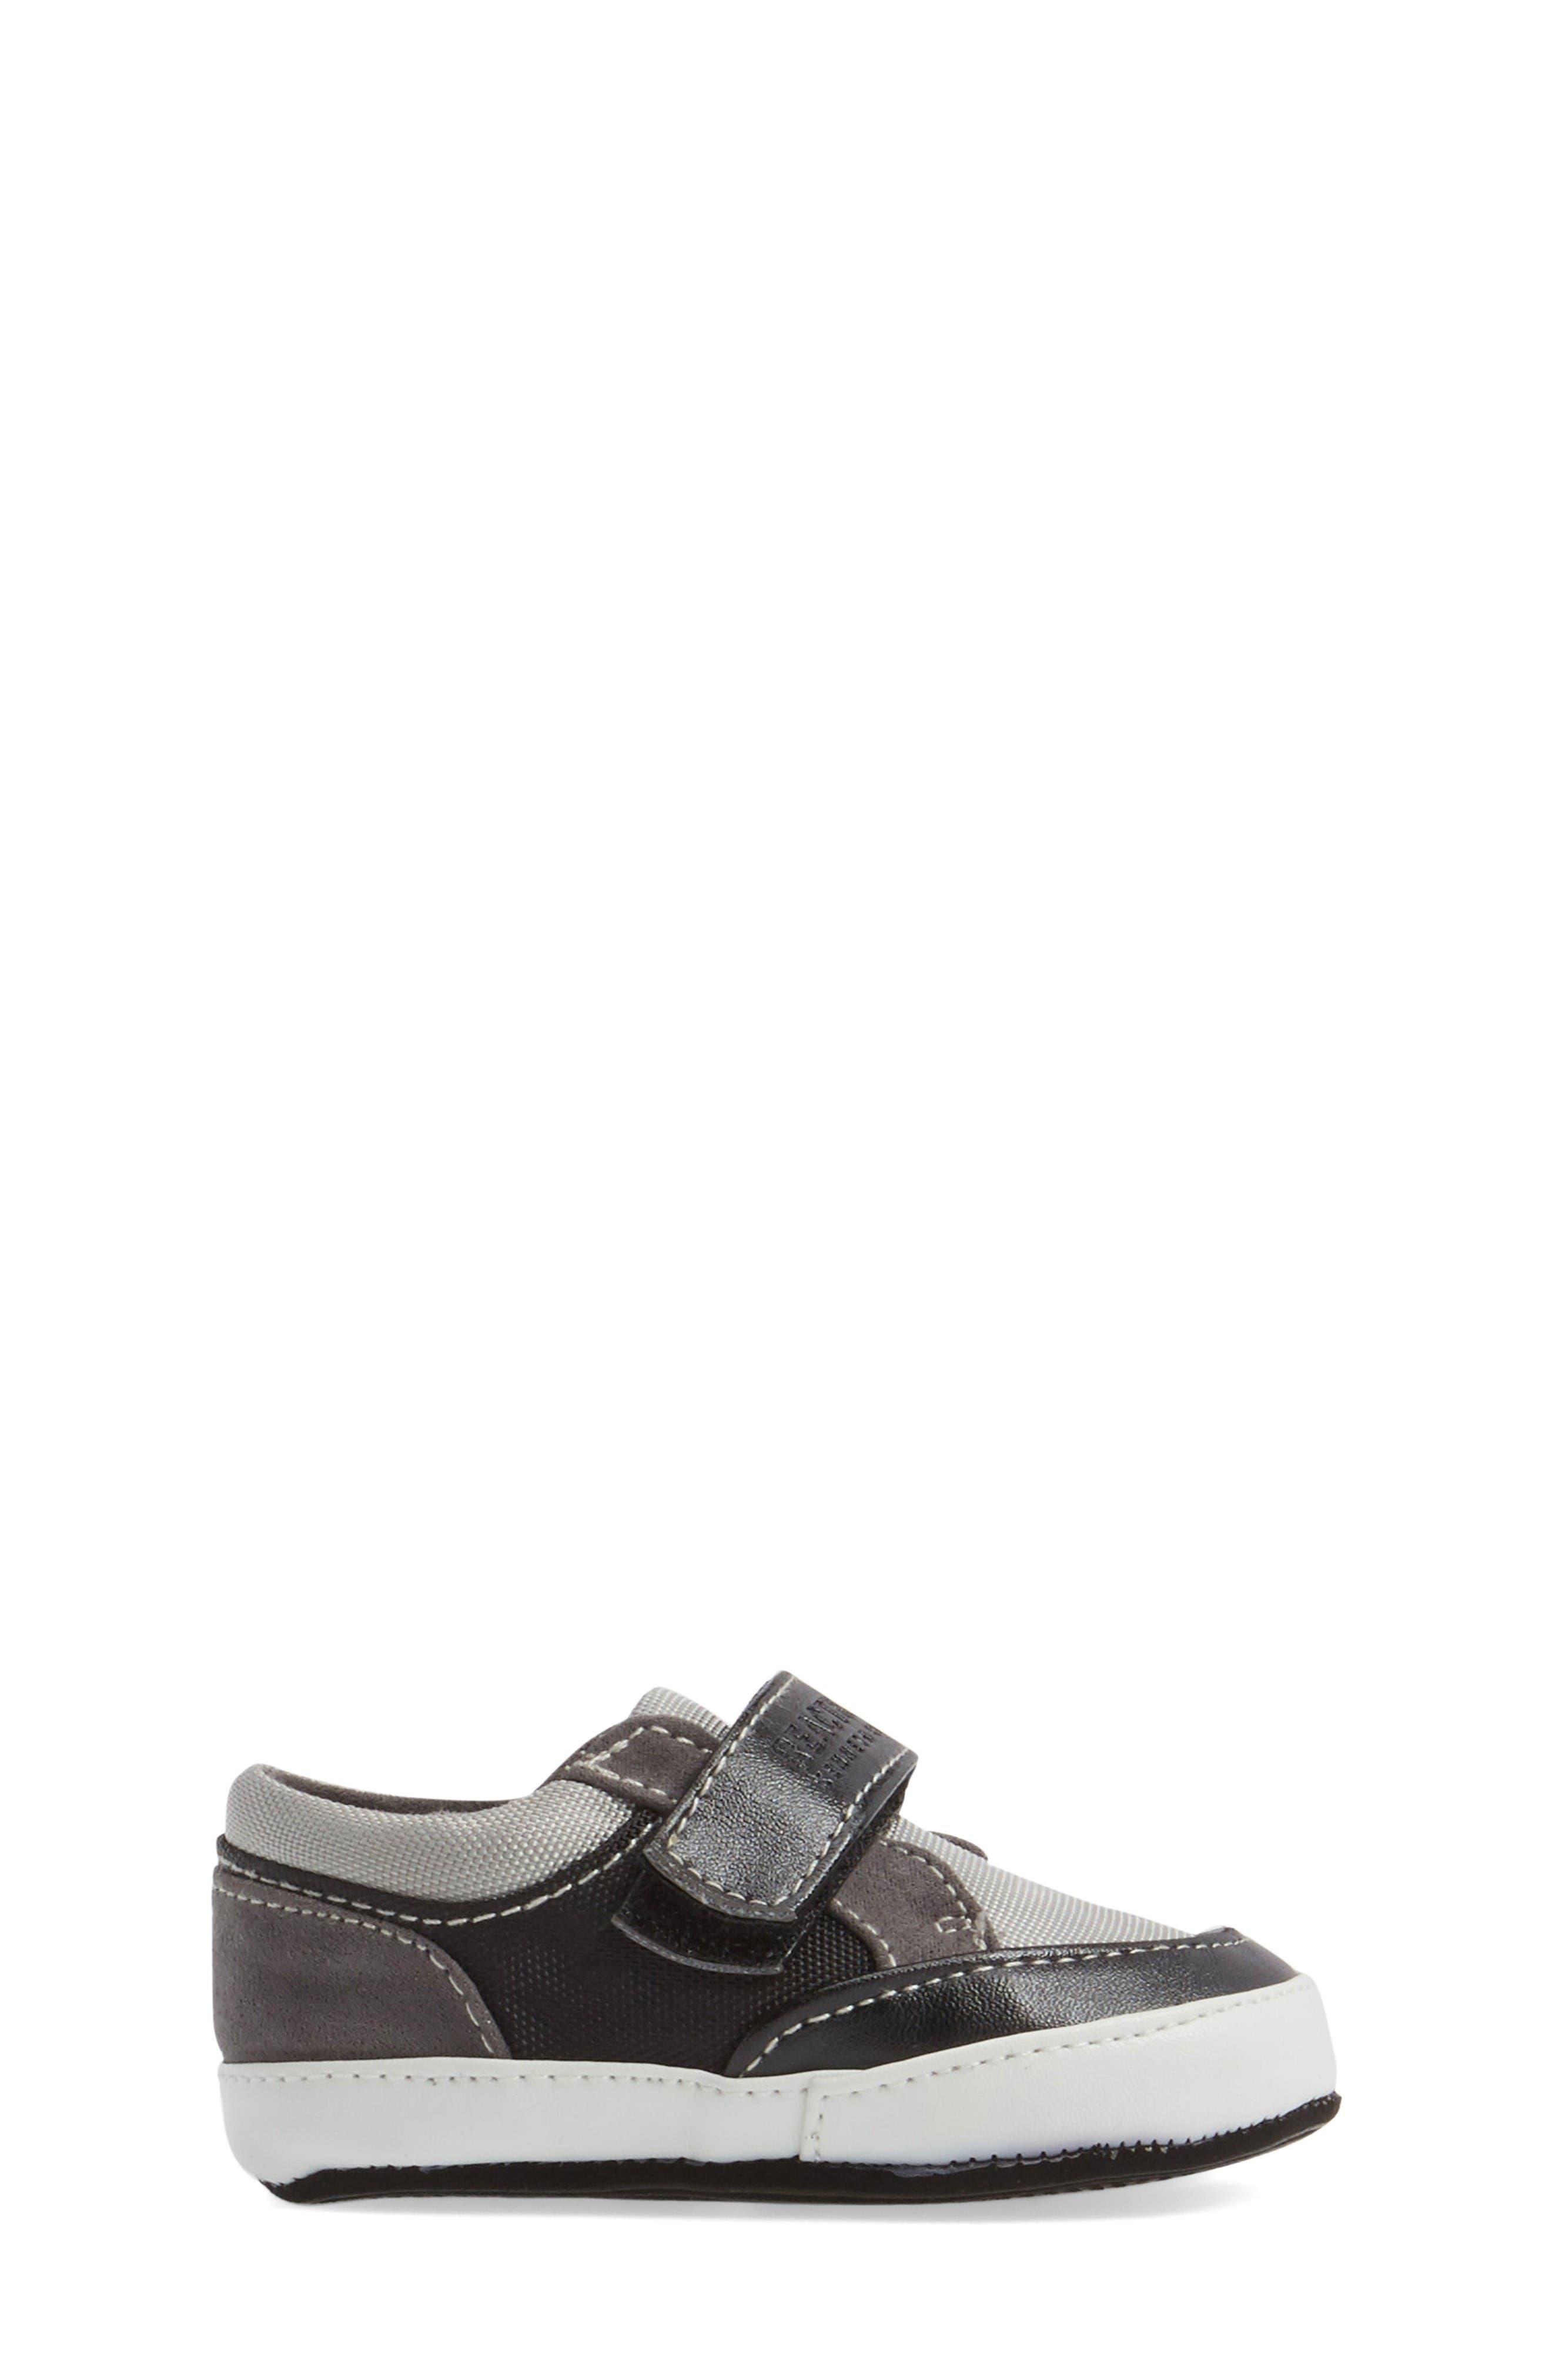 Danny Sneaker,                             Alternate thumbnail 3, color,                             Black/ Grey